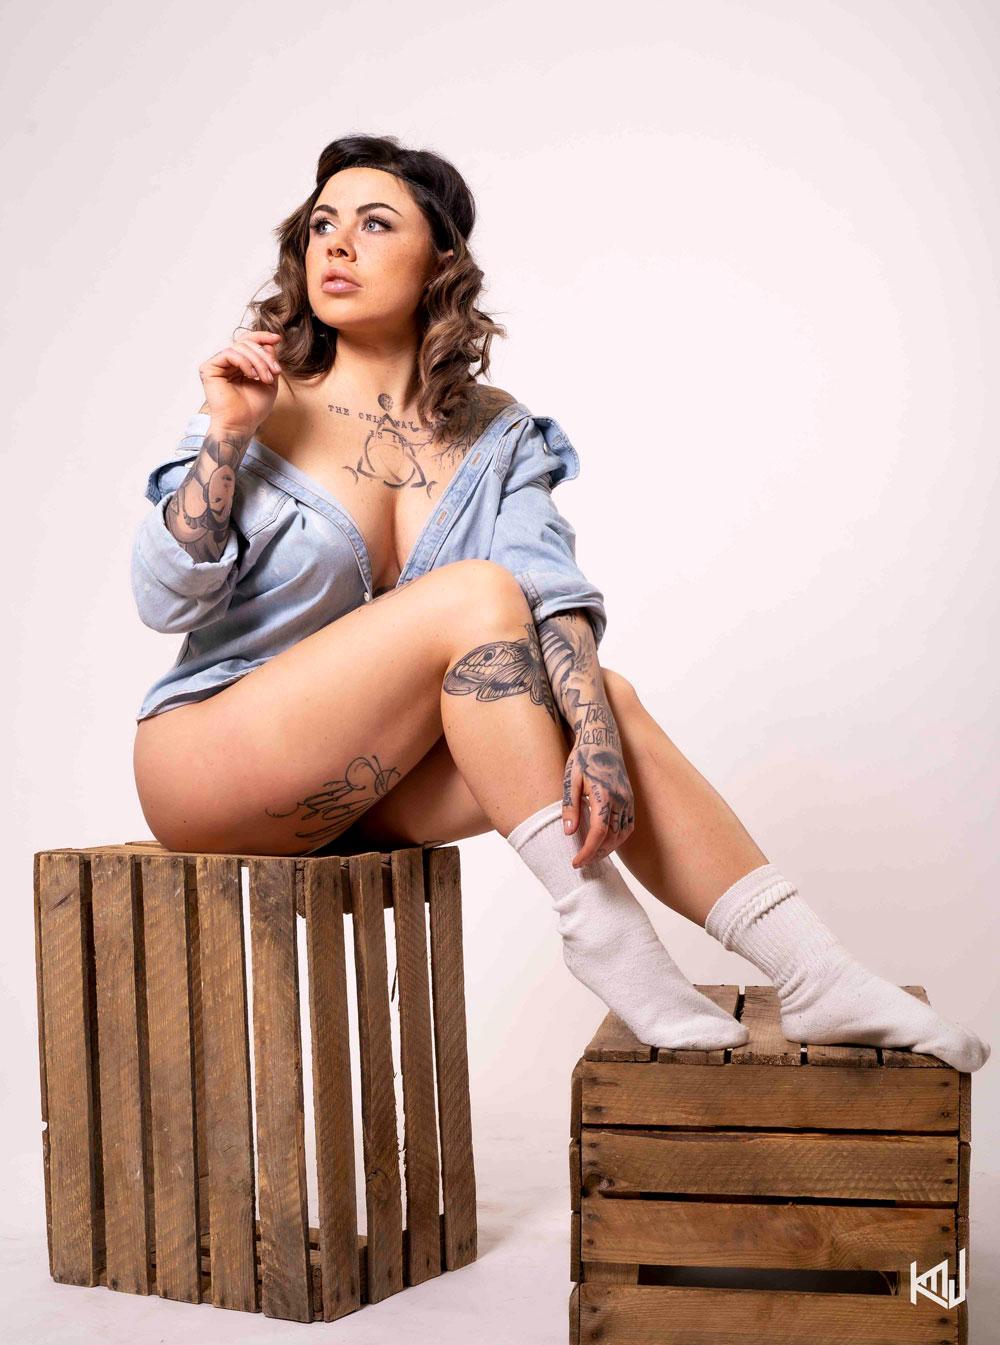 Fotoshooting in Köln | Fotoshooting Tattoos | Fotograf Fotostudio